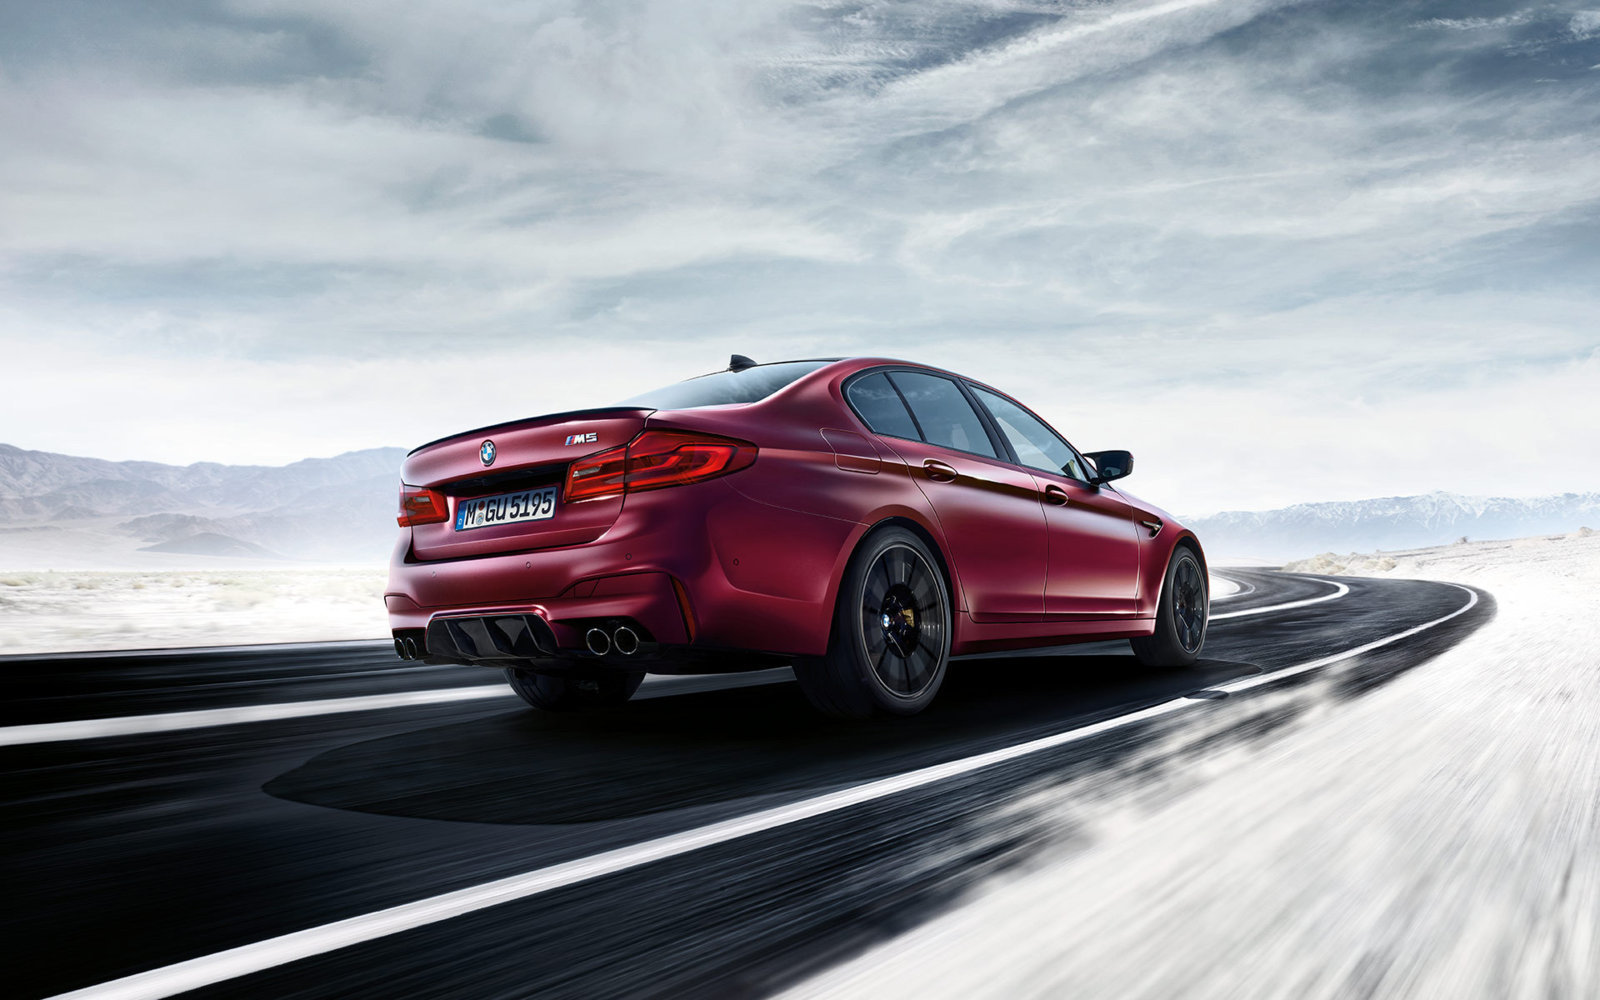 BMW-M5-2018-Wallpaper-8.jpg